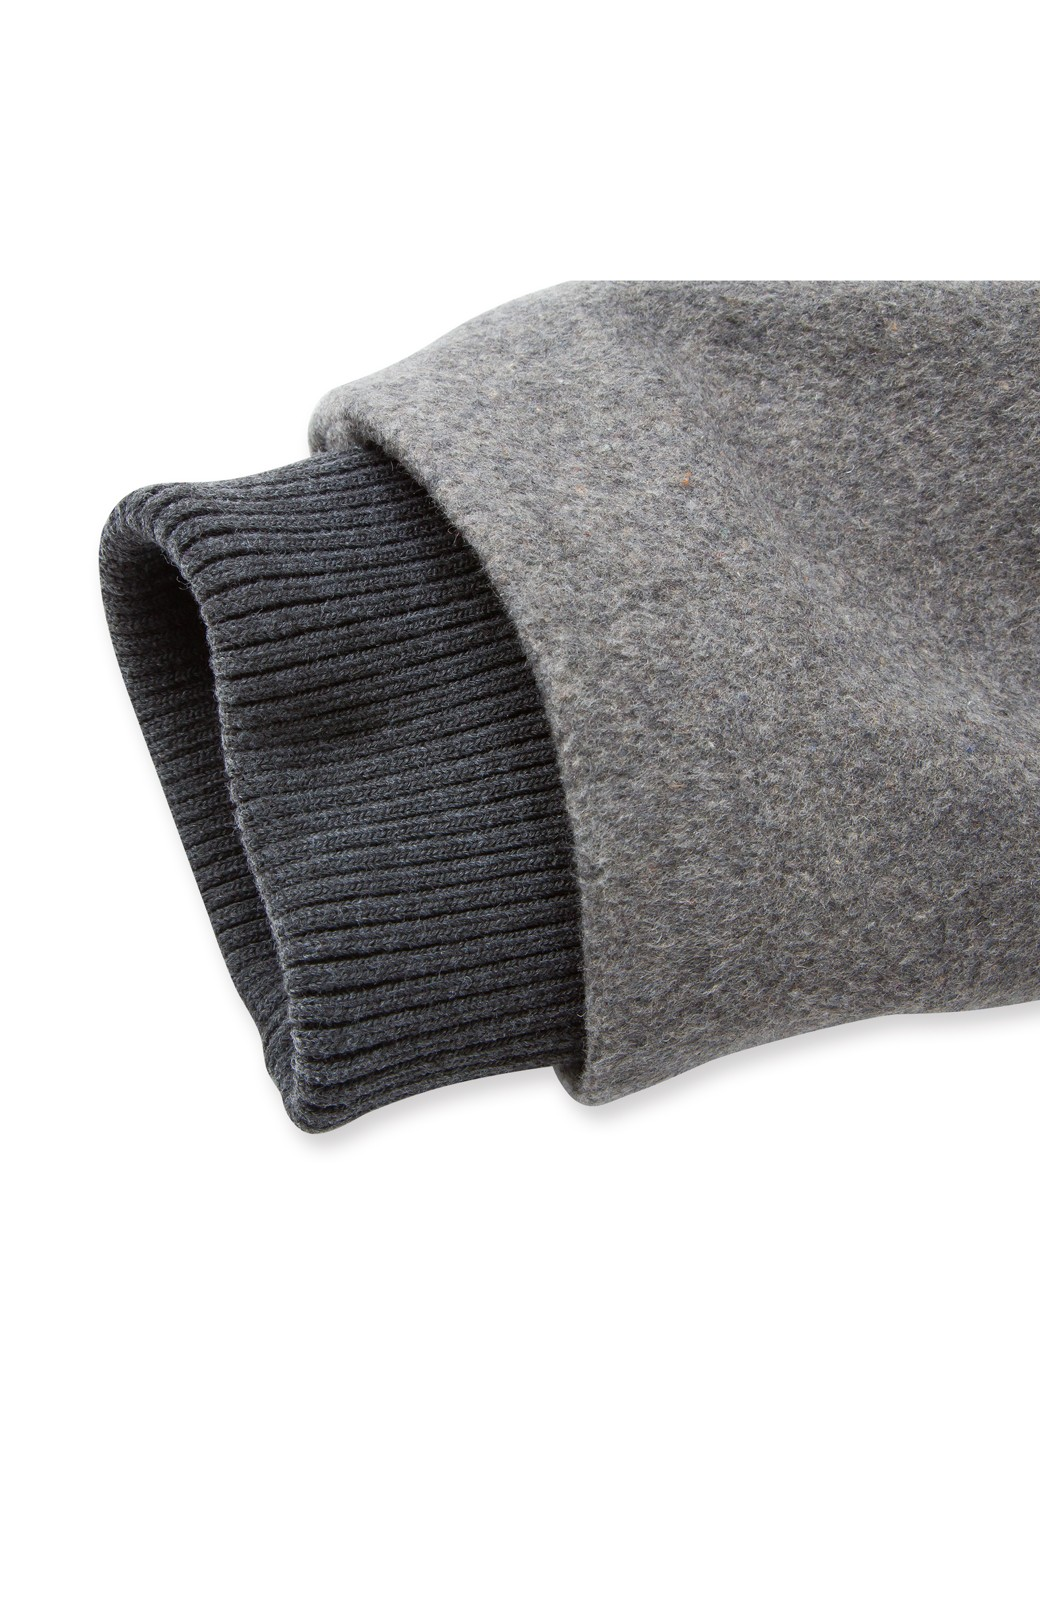 pilvee 取り外しフェイクファー衿付き ウール混のノーカラーコート <グレー>の商品写真5